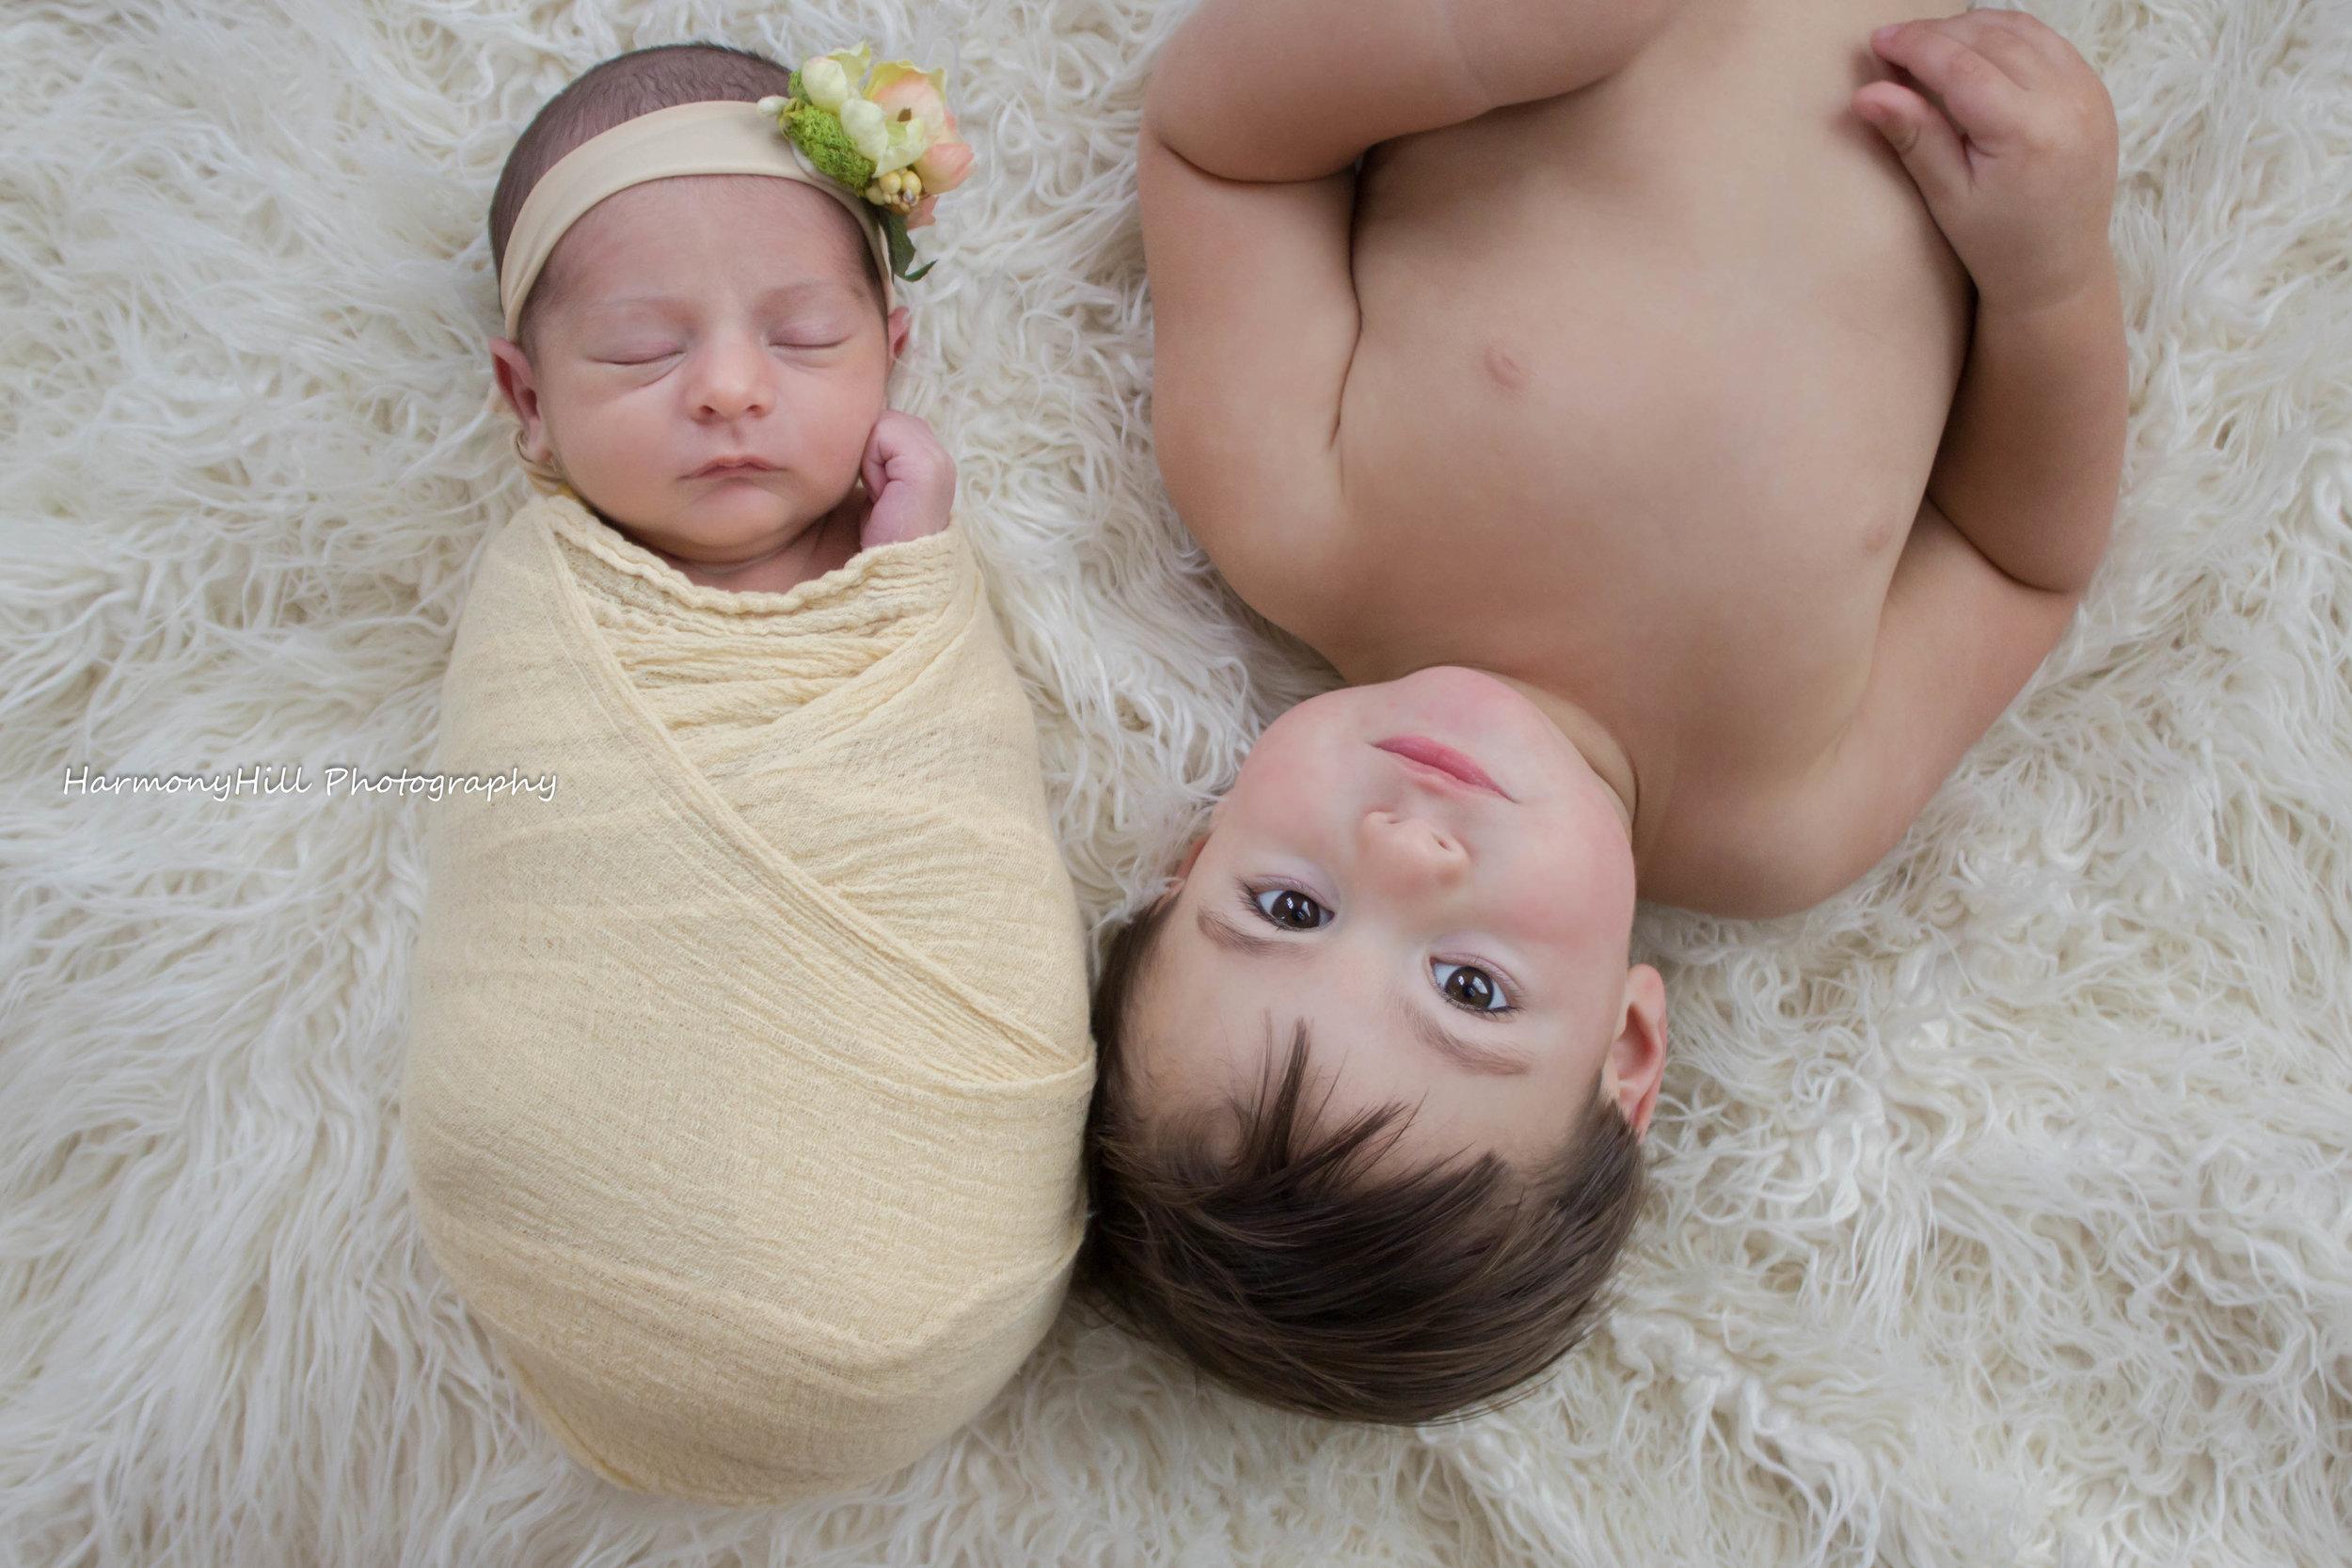 newborn photography catskills harmony hill photography greene county